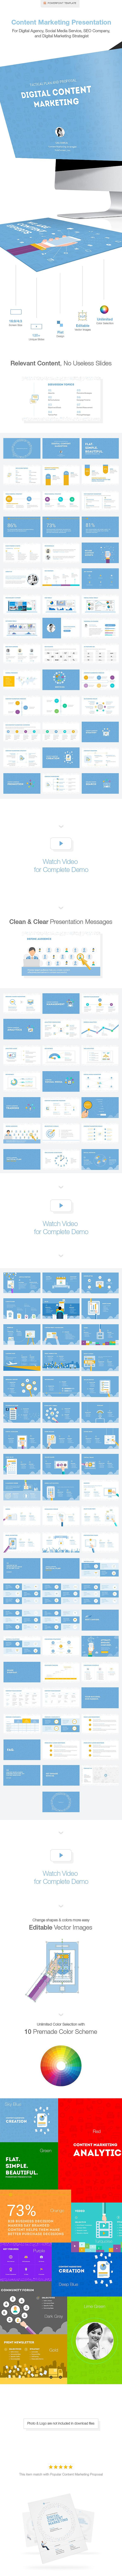 GraphicRiver Clean Content Marketing Presentation 11229530